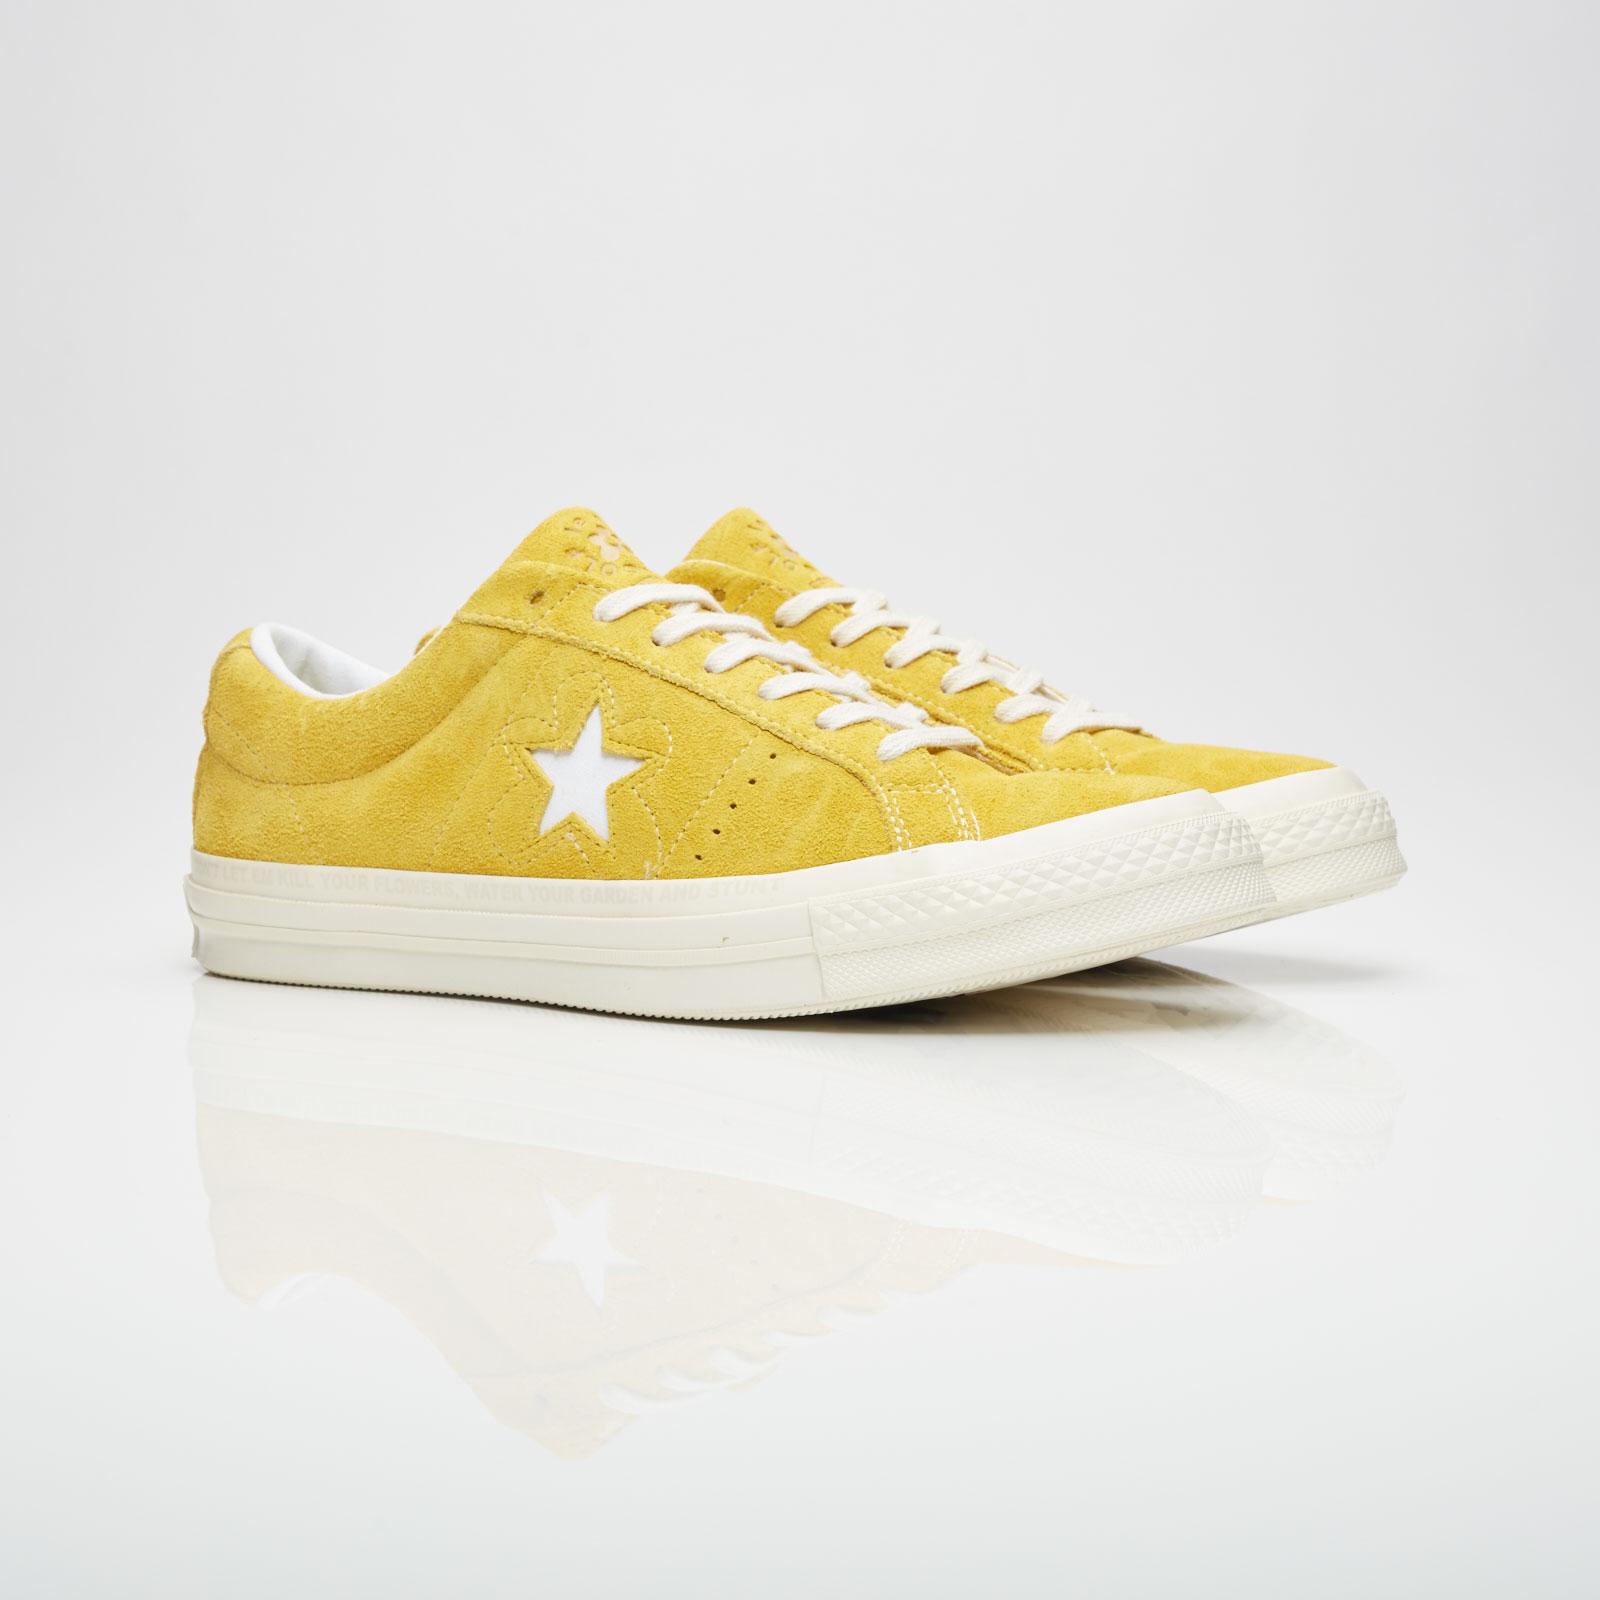 Converse One Star X Golf Le Fleur 159435c Sneakersnstuff